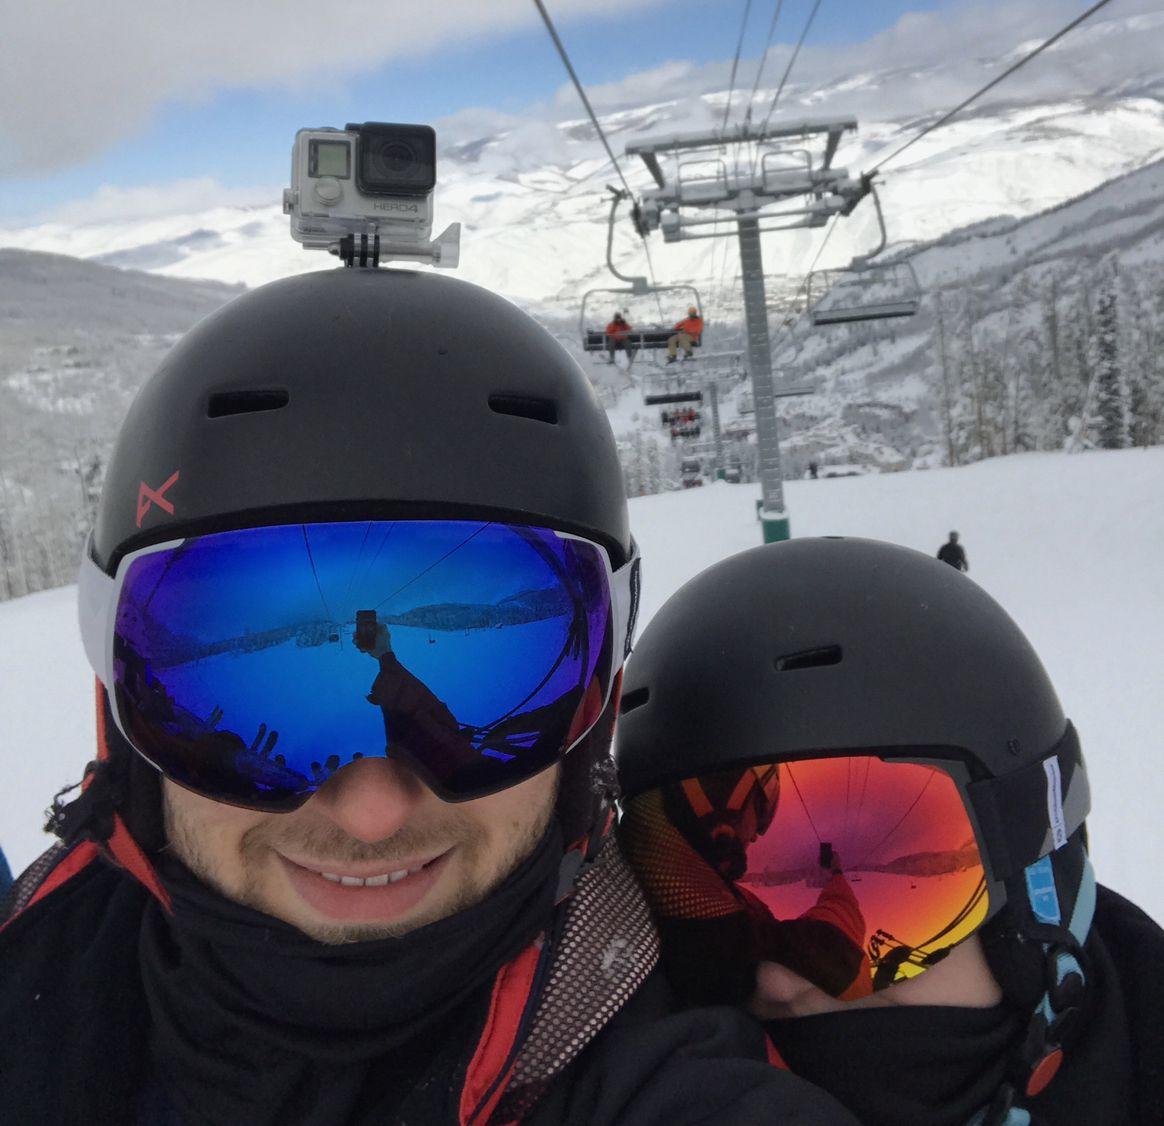 Colorado Skiing Ski Lift Rocky Mountains Couple Goggles